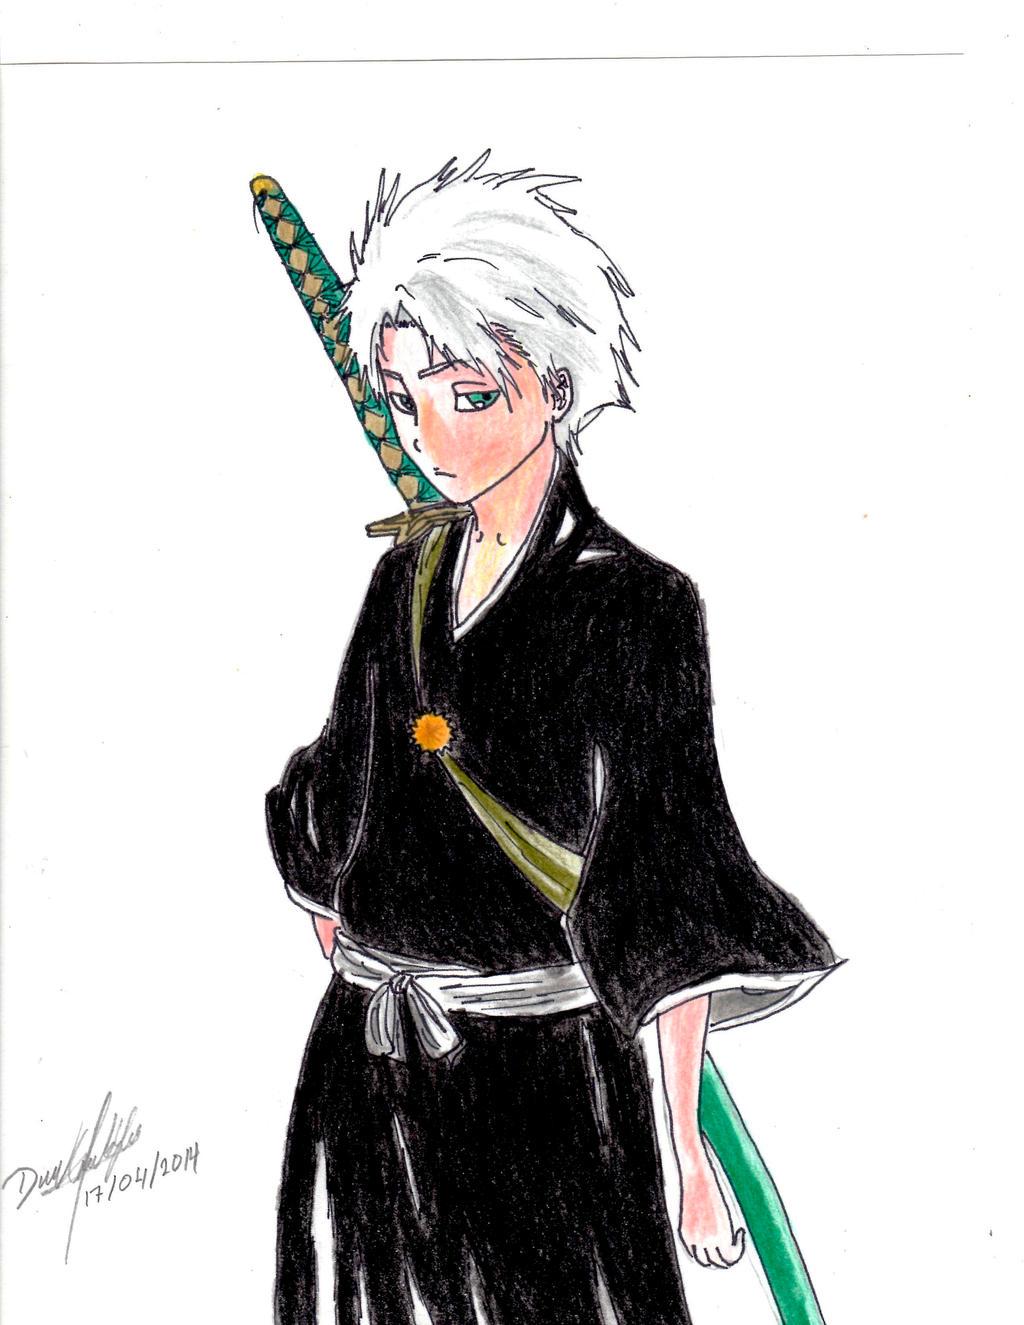 Hitsugaya Toshiro by danielcamilo